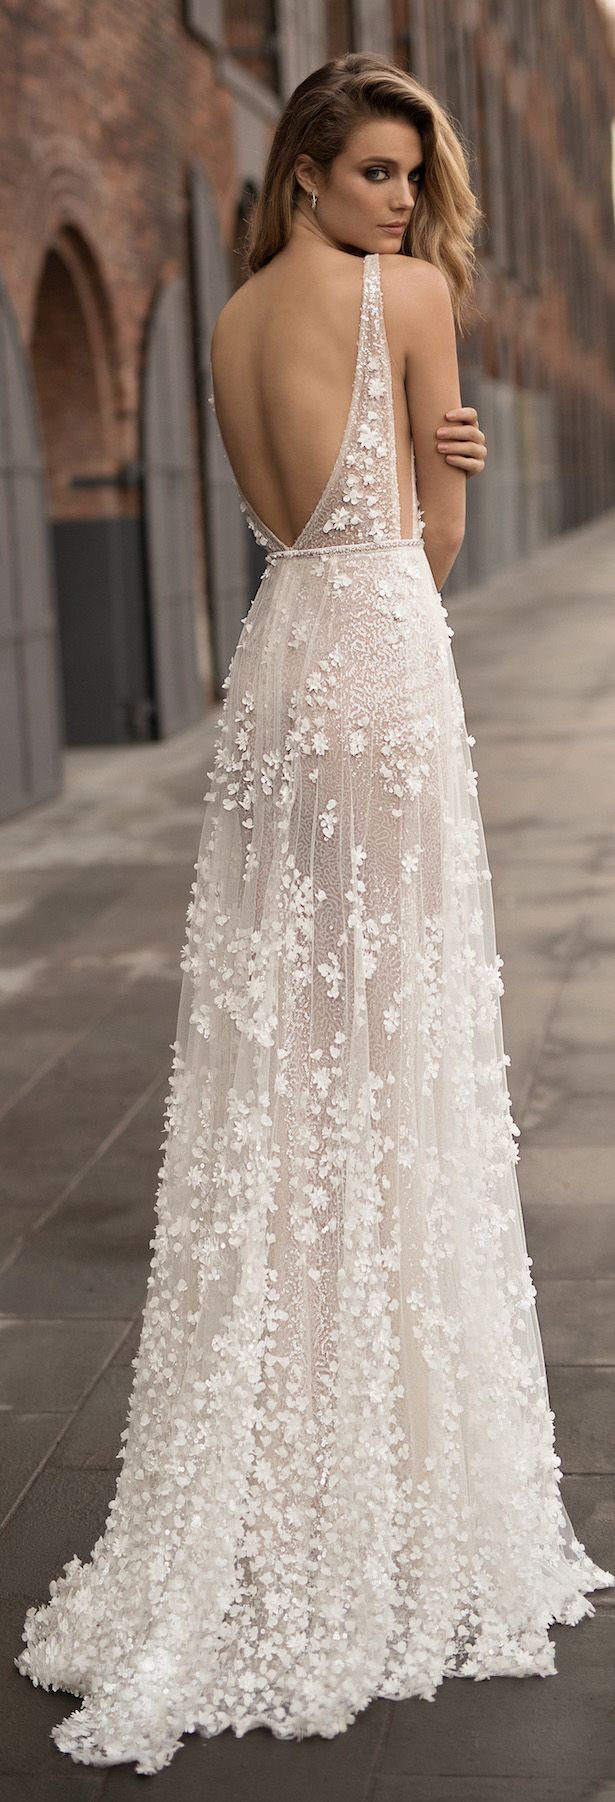 Berta wedding dress collection spring elegant bridal dresses